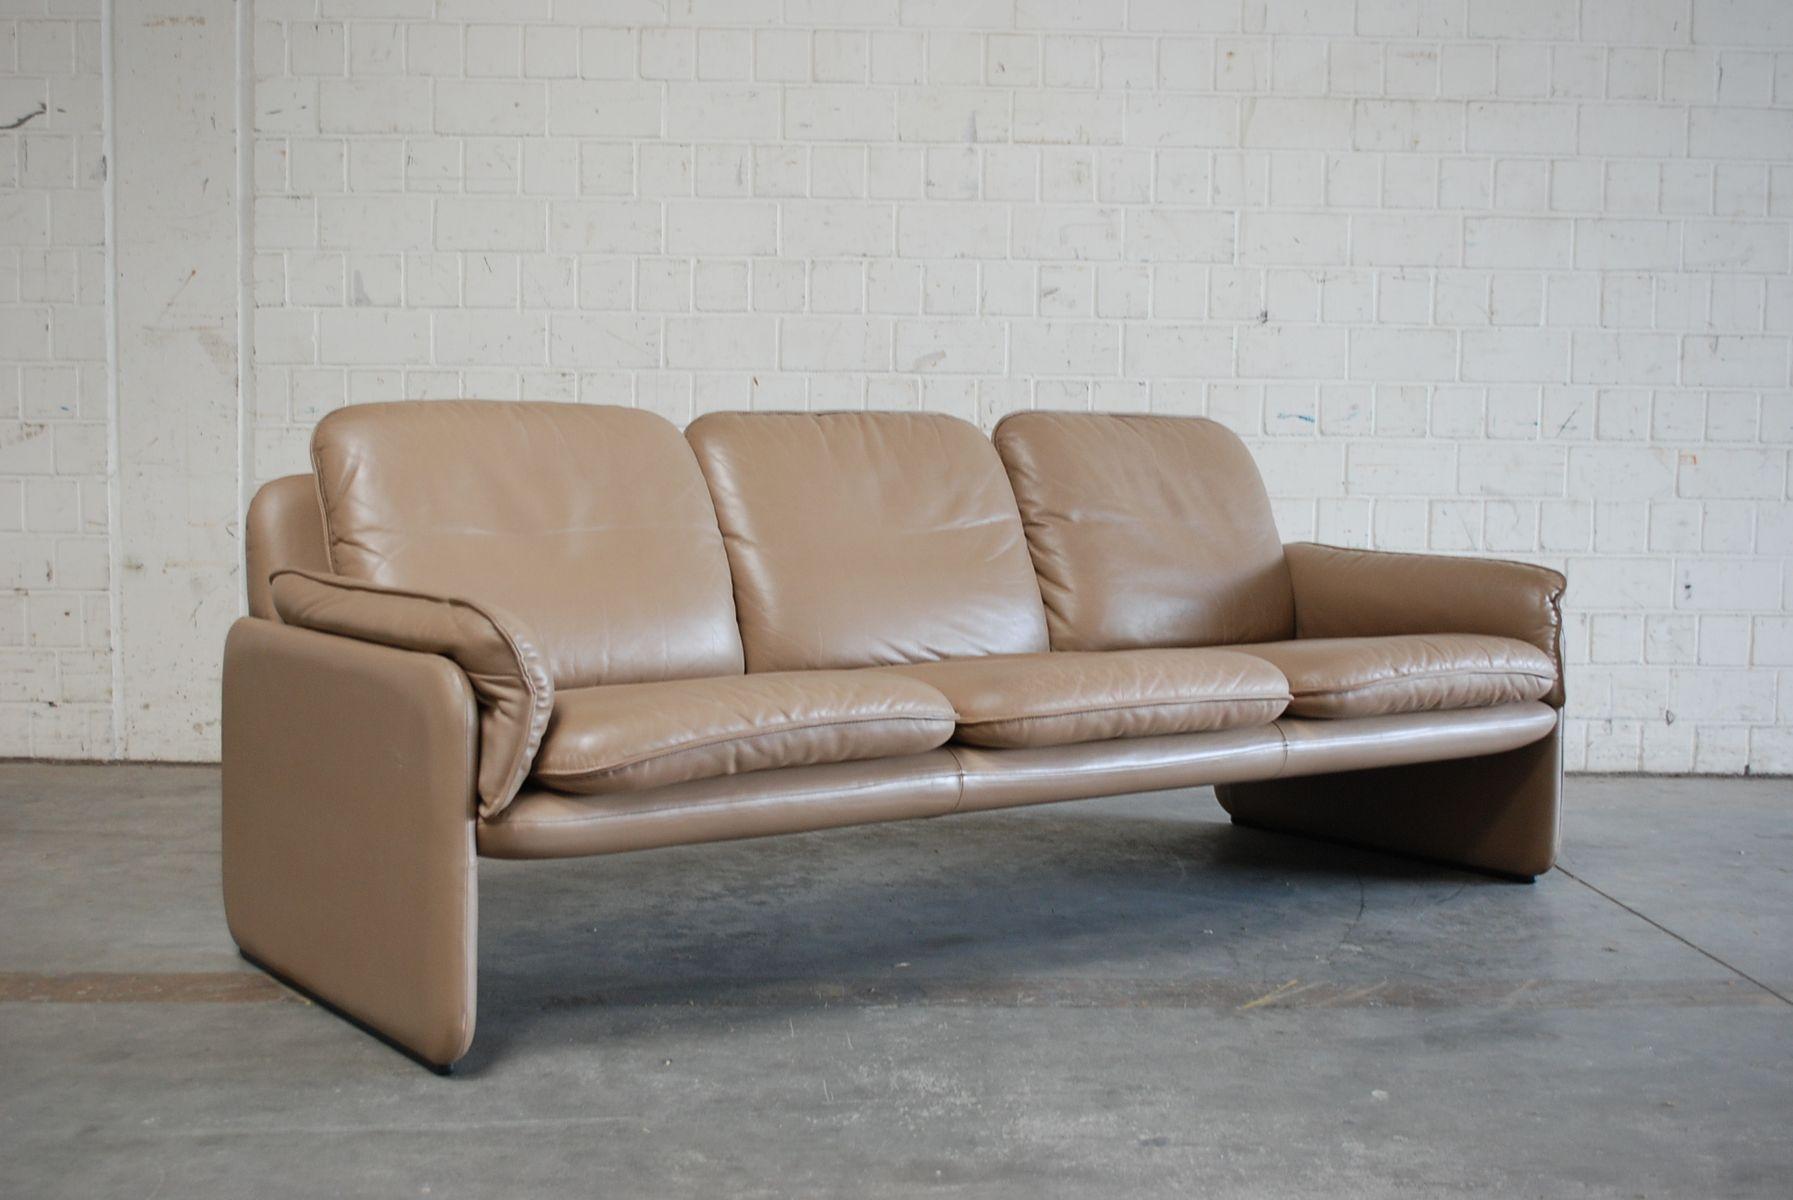 vintage ds 61 ledersofa und lounge stuhl von de sede bei pamono kaufen. Black Bedroom Furniture Sets. Home Design Ideas